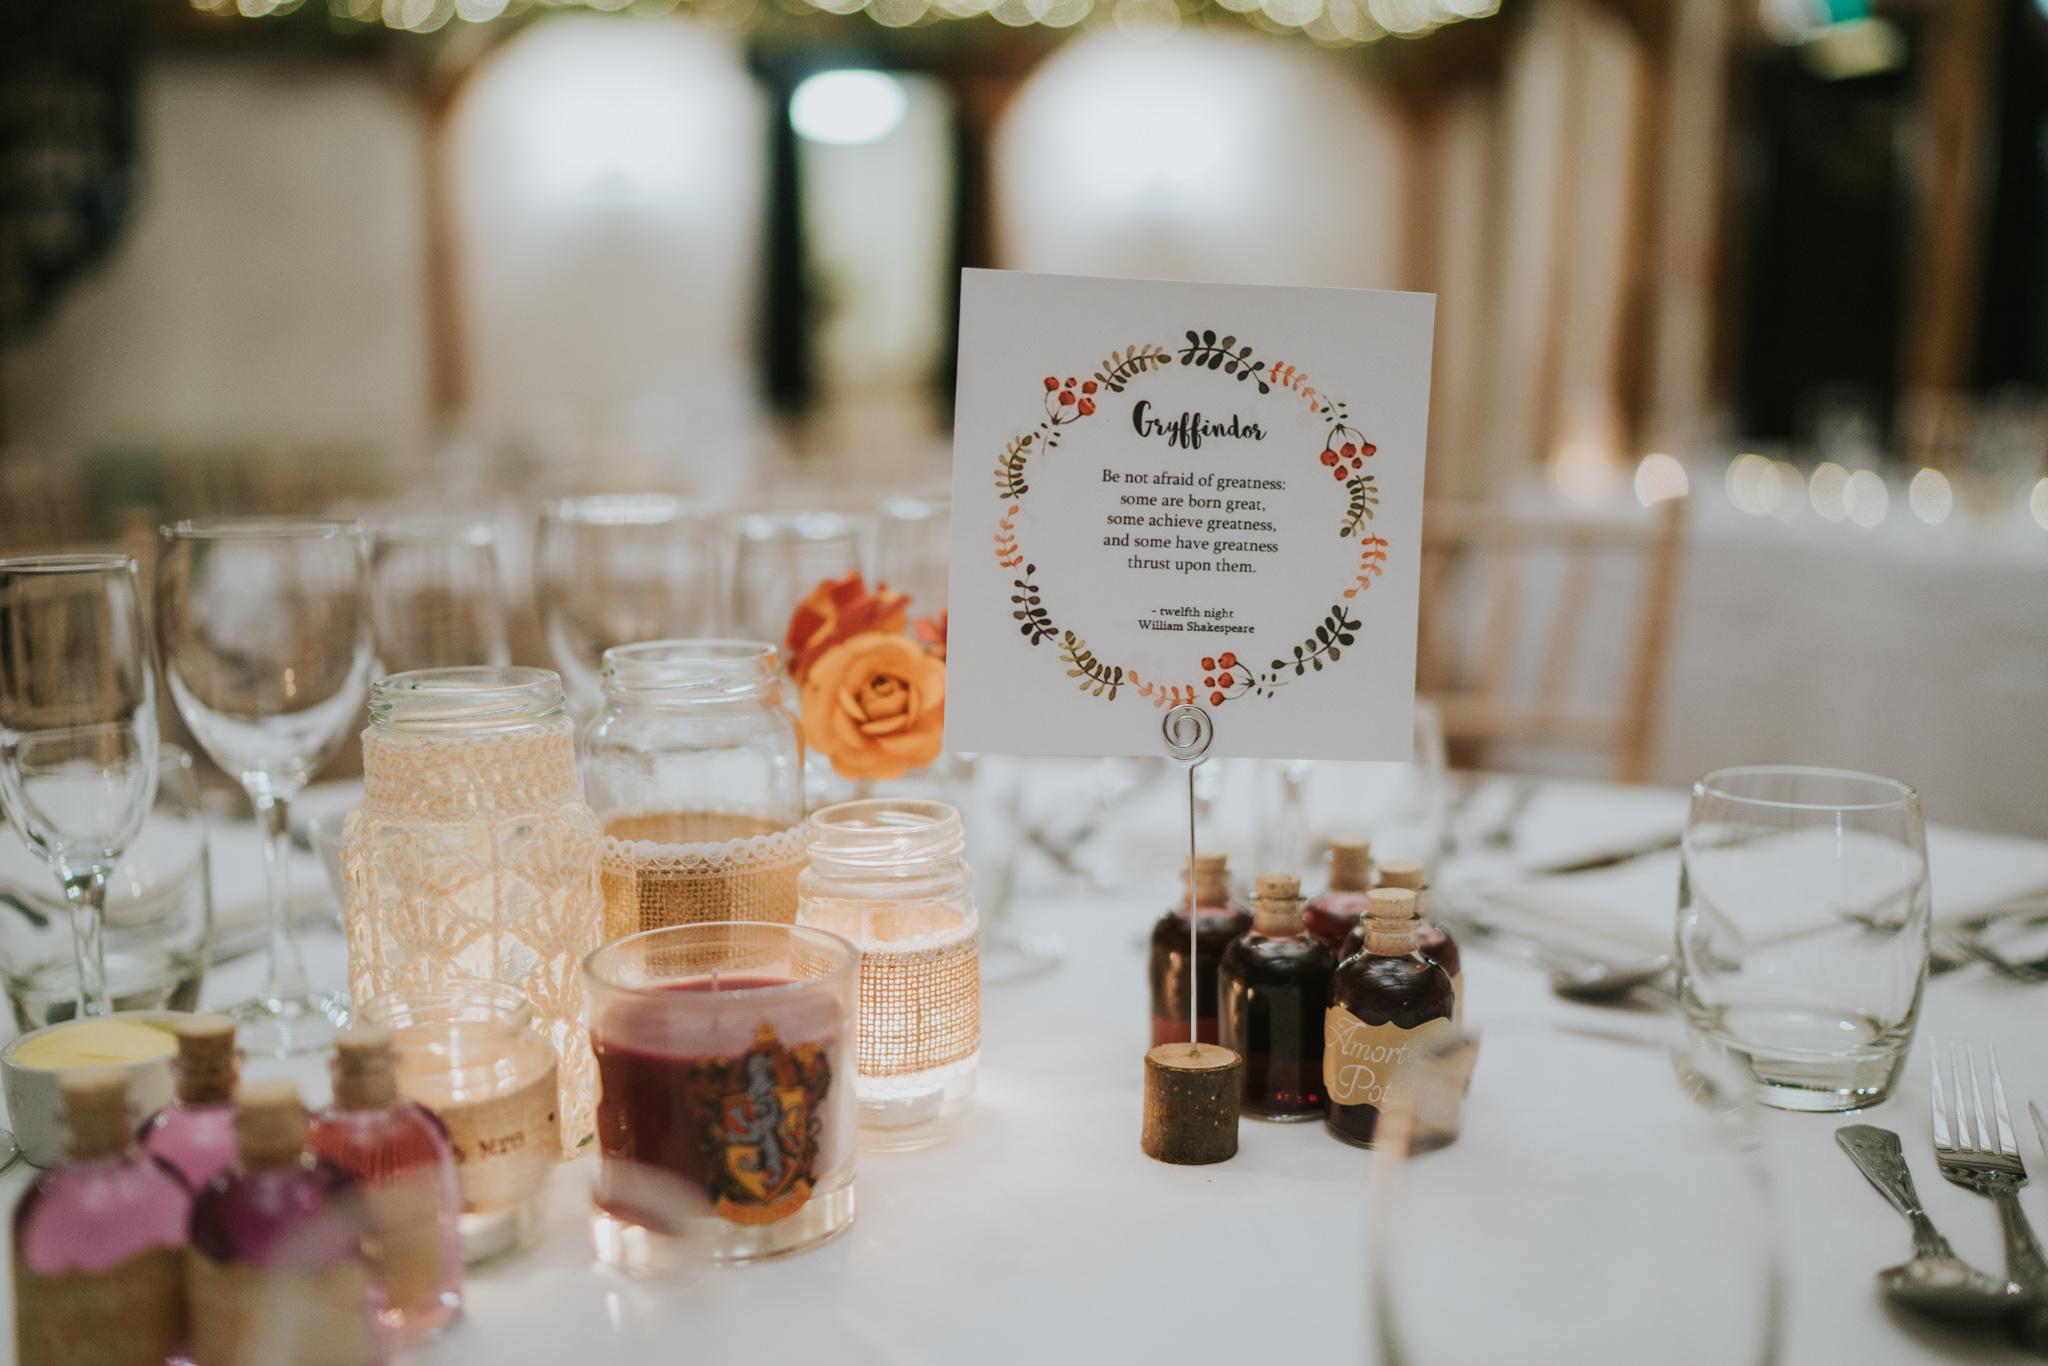 rhia-james-rustic-crabbs-barn-vintage-50s-retro-wedding-grace-elizabeth-colchester-essex-alternative-relaxed-wedding-family-photography-devon-suffolk-norfolk-essex (105 of 138).jpg